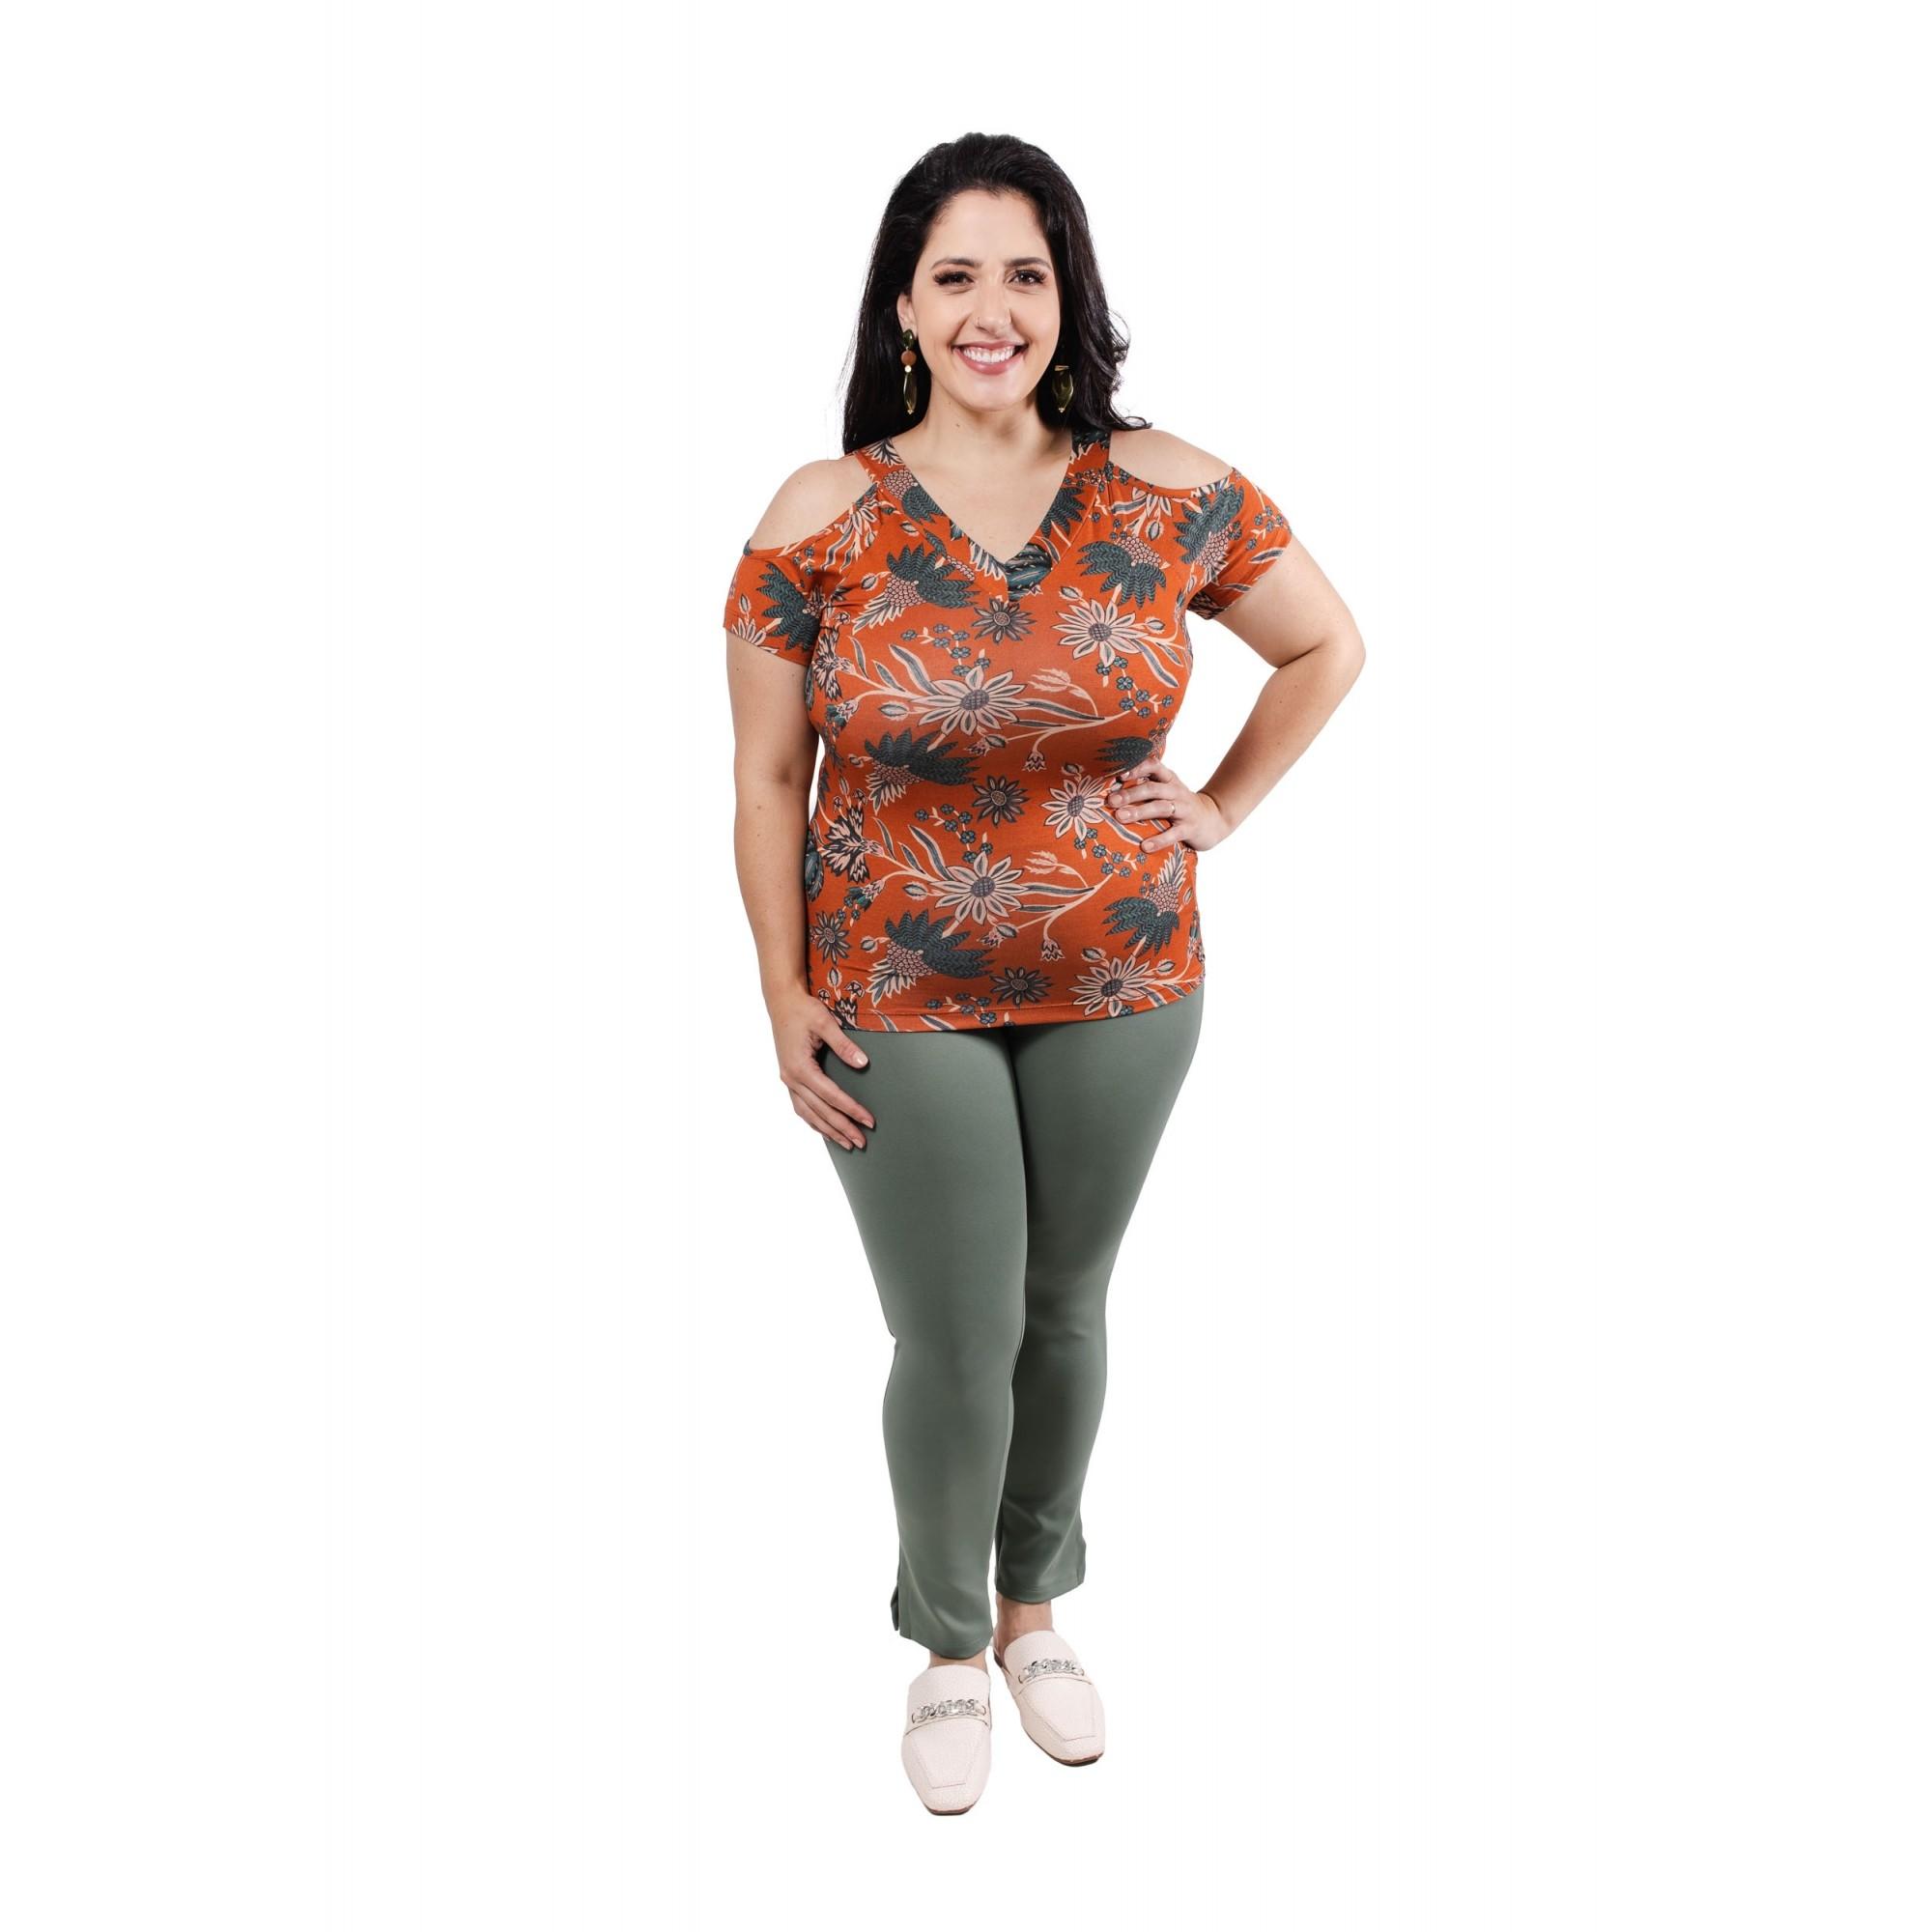 Blusa Feminina Estampada Ombros Abertos Plus Size